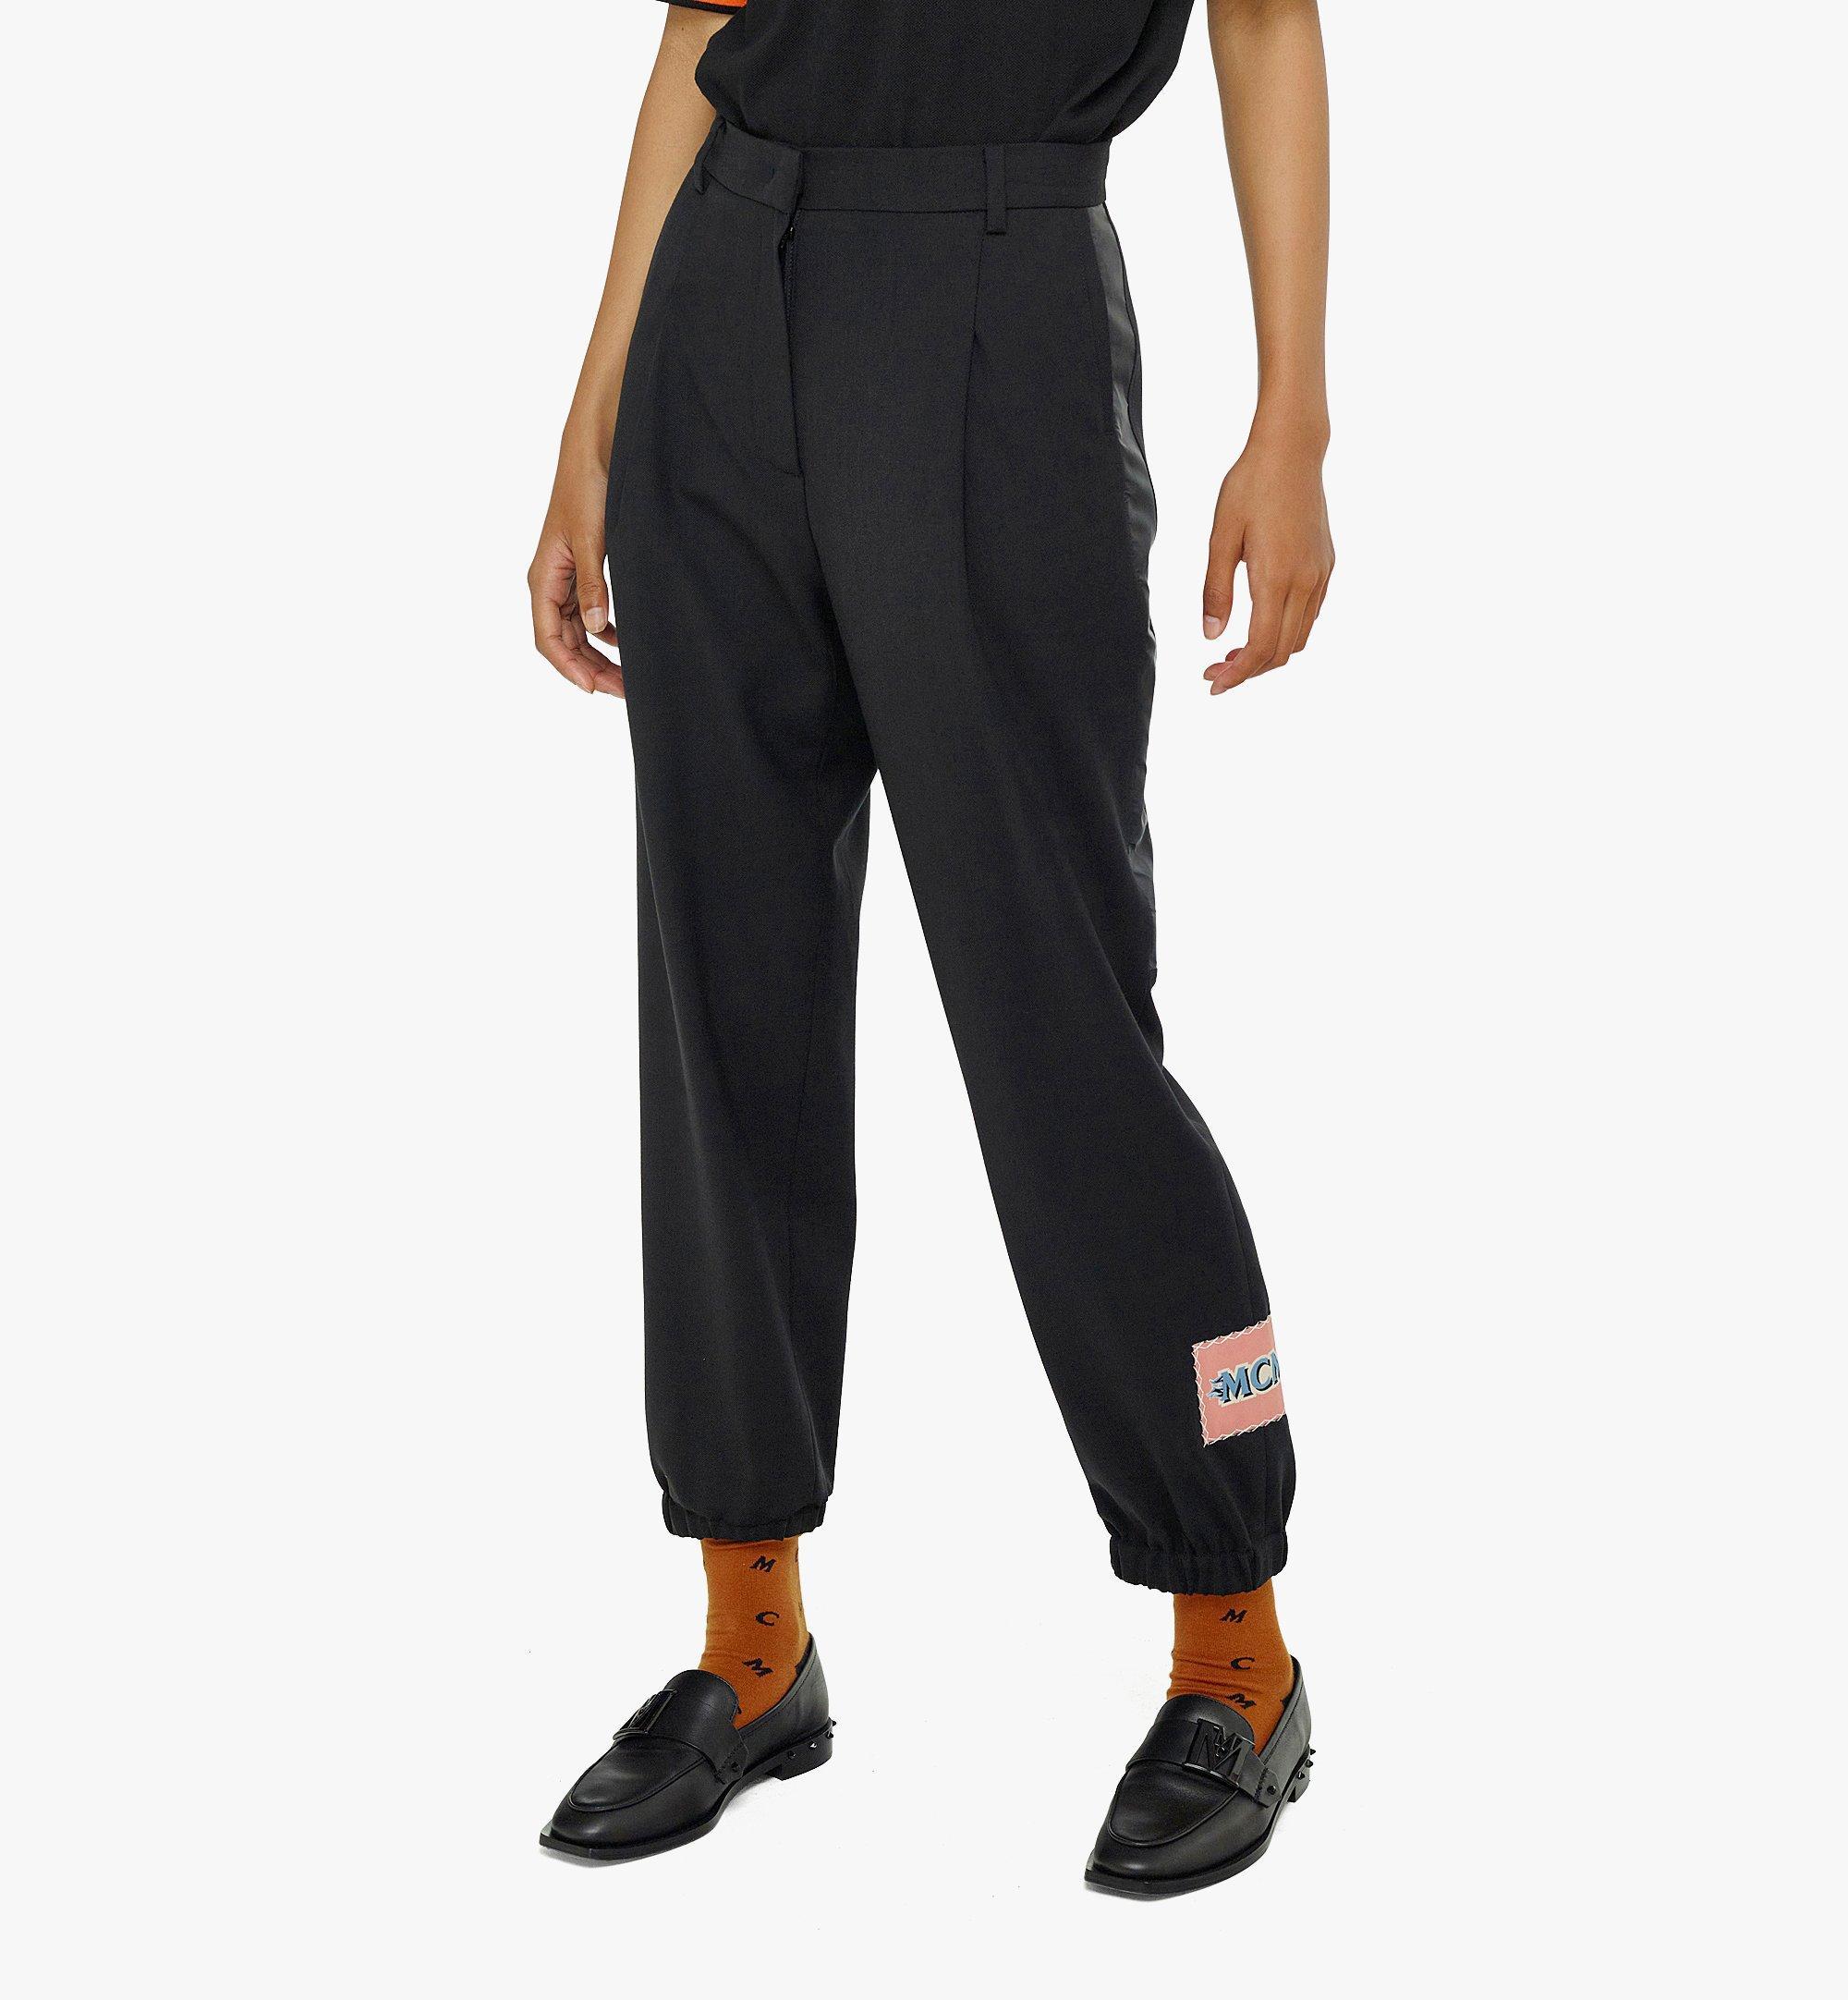 MCM Women's Wool Jogging Pants Black MFPBAMM02BK040 Alternate View 2